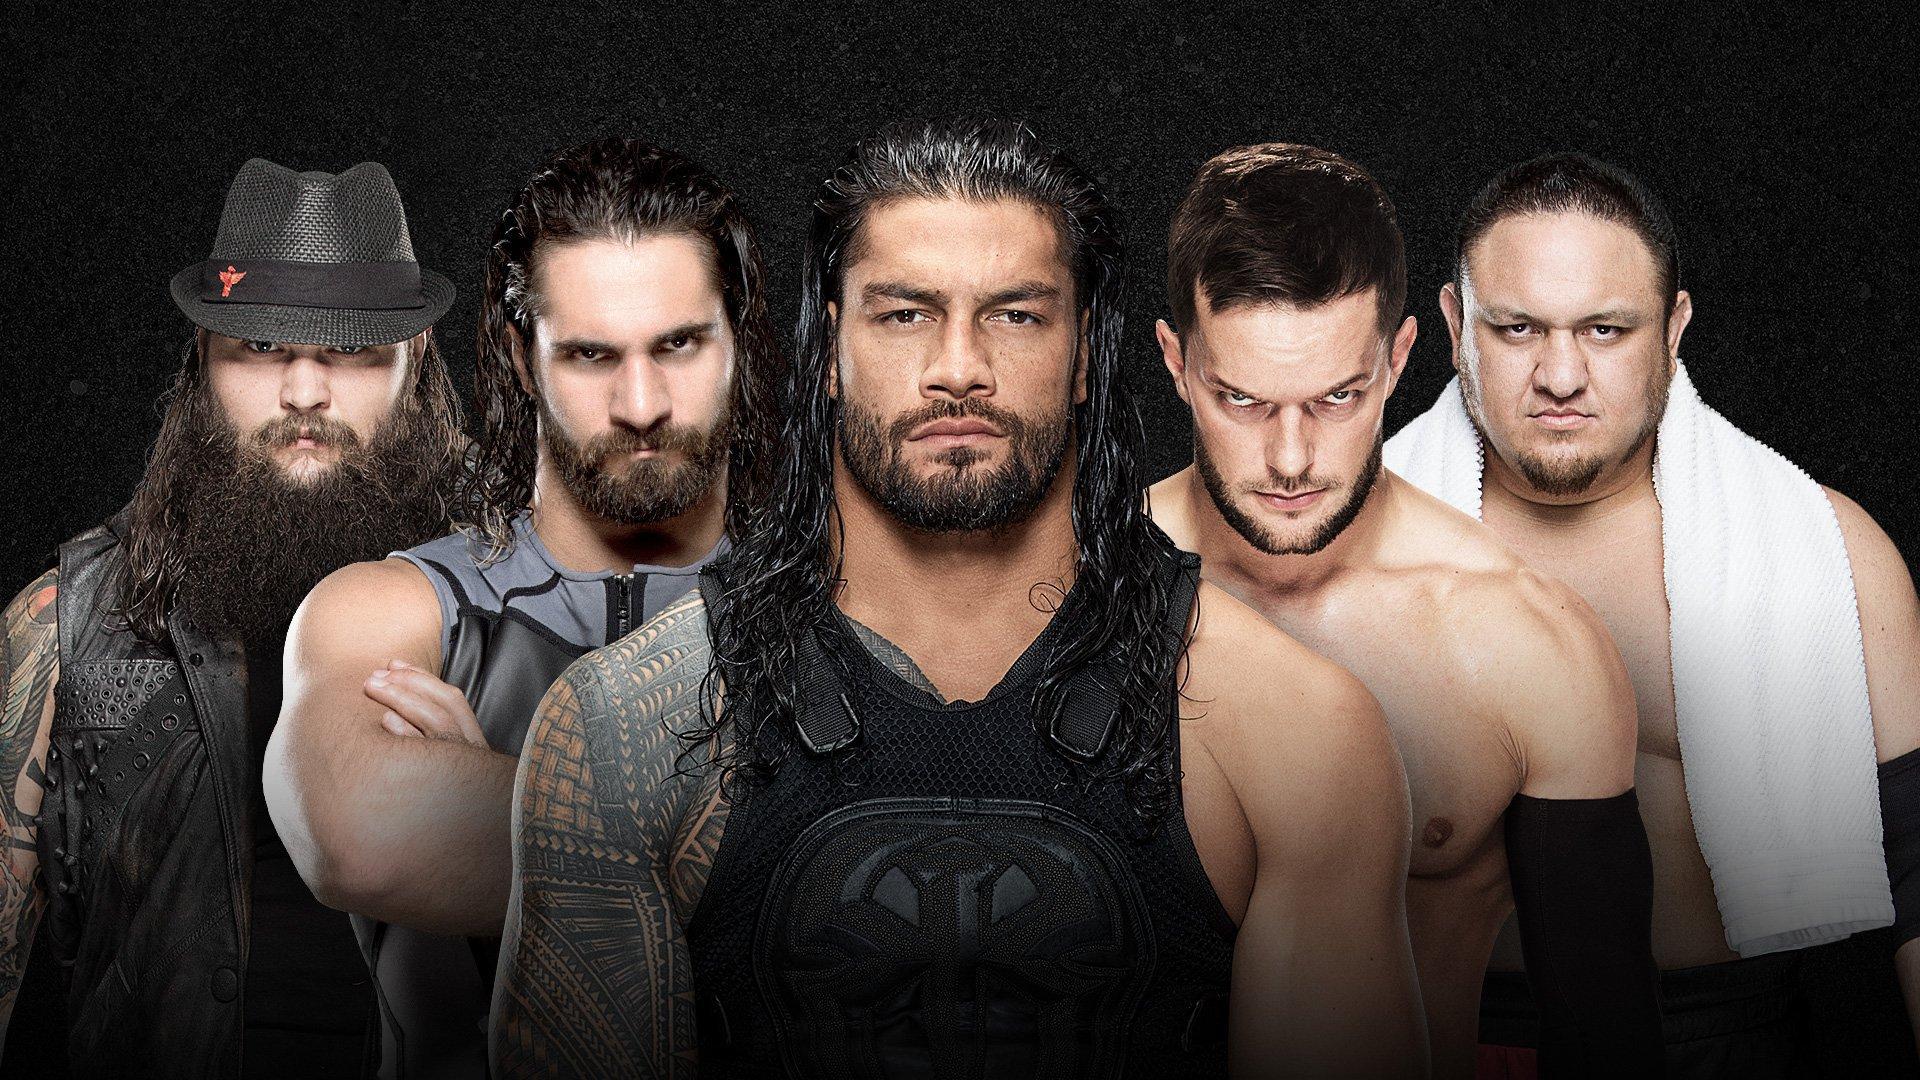 WWE Extreme Rules 2017: Bray Wyatt vs. Seth Rollins vs. Roman Reigns vs. Finn Bálor vs. Samoa Joe